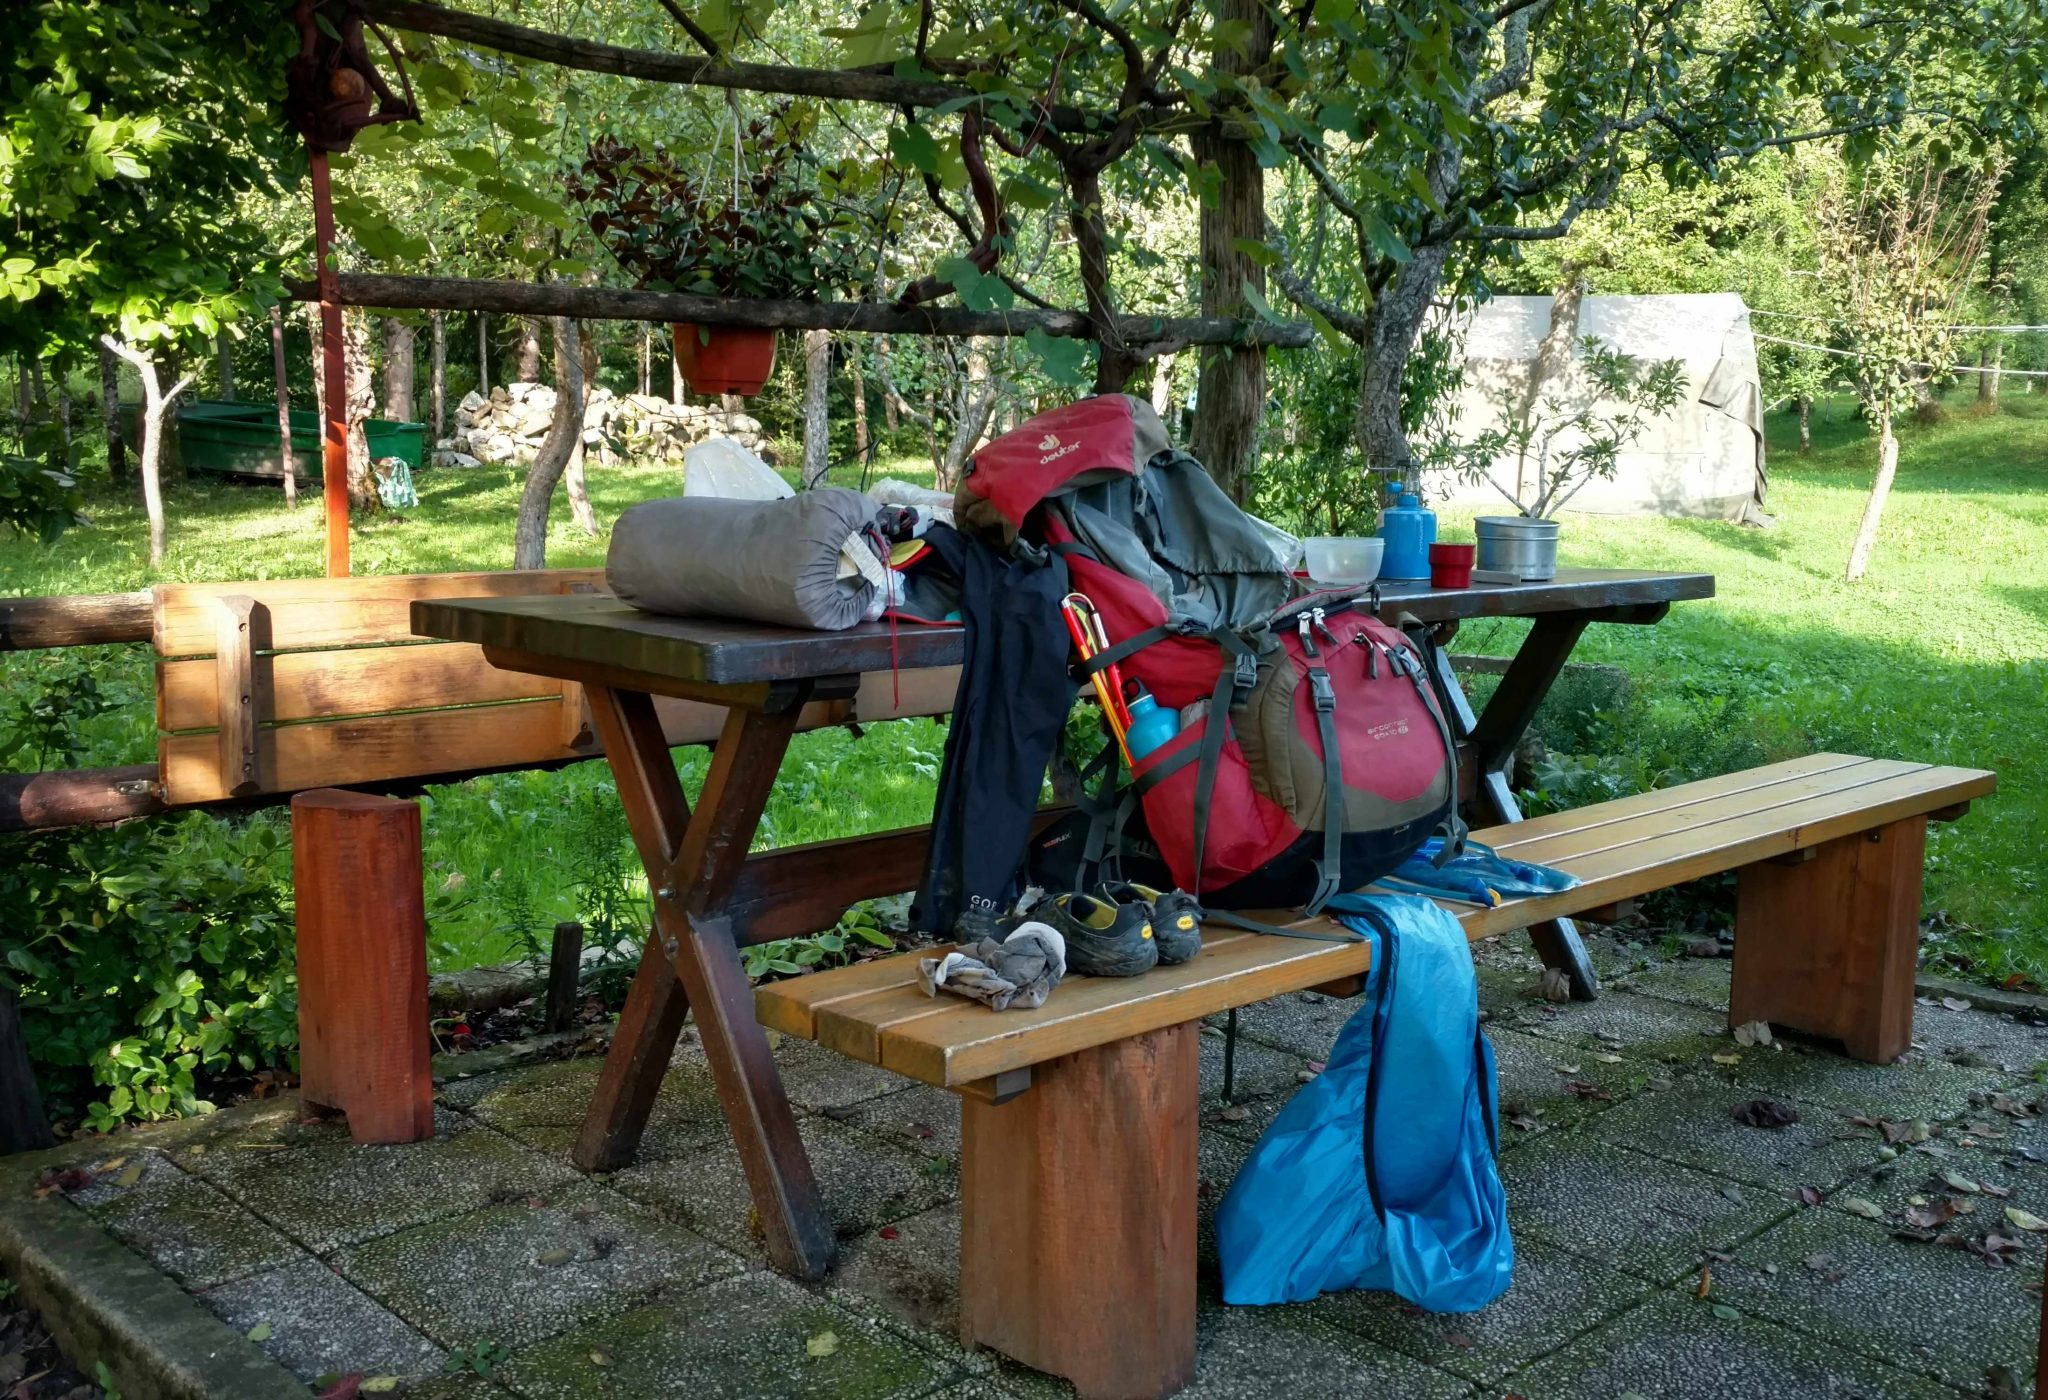 Tuinkamperen slovenië | Slapen tussen de beren